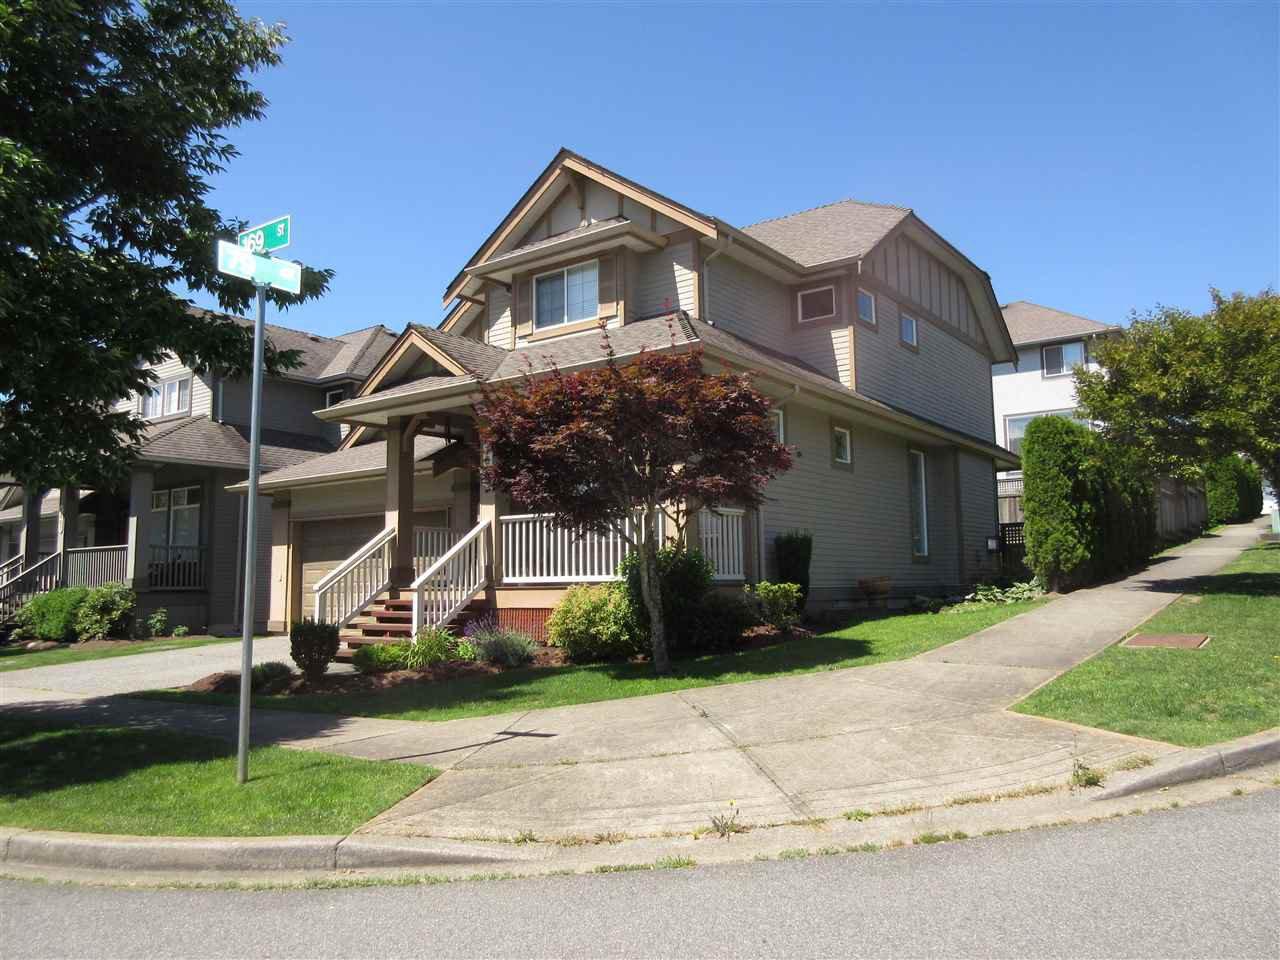 Photo 6: Photos: 7895 169 STREET in Surrey: Fleetwood Tynehead House for sale : MLS®# R2086926